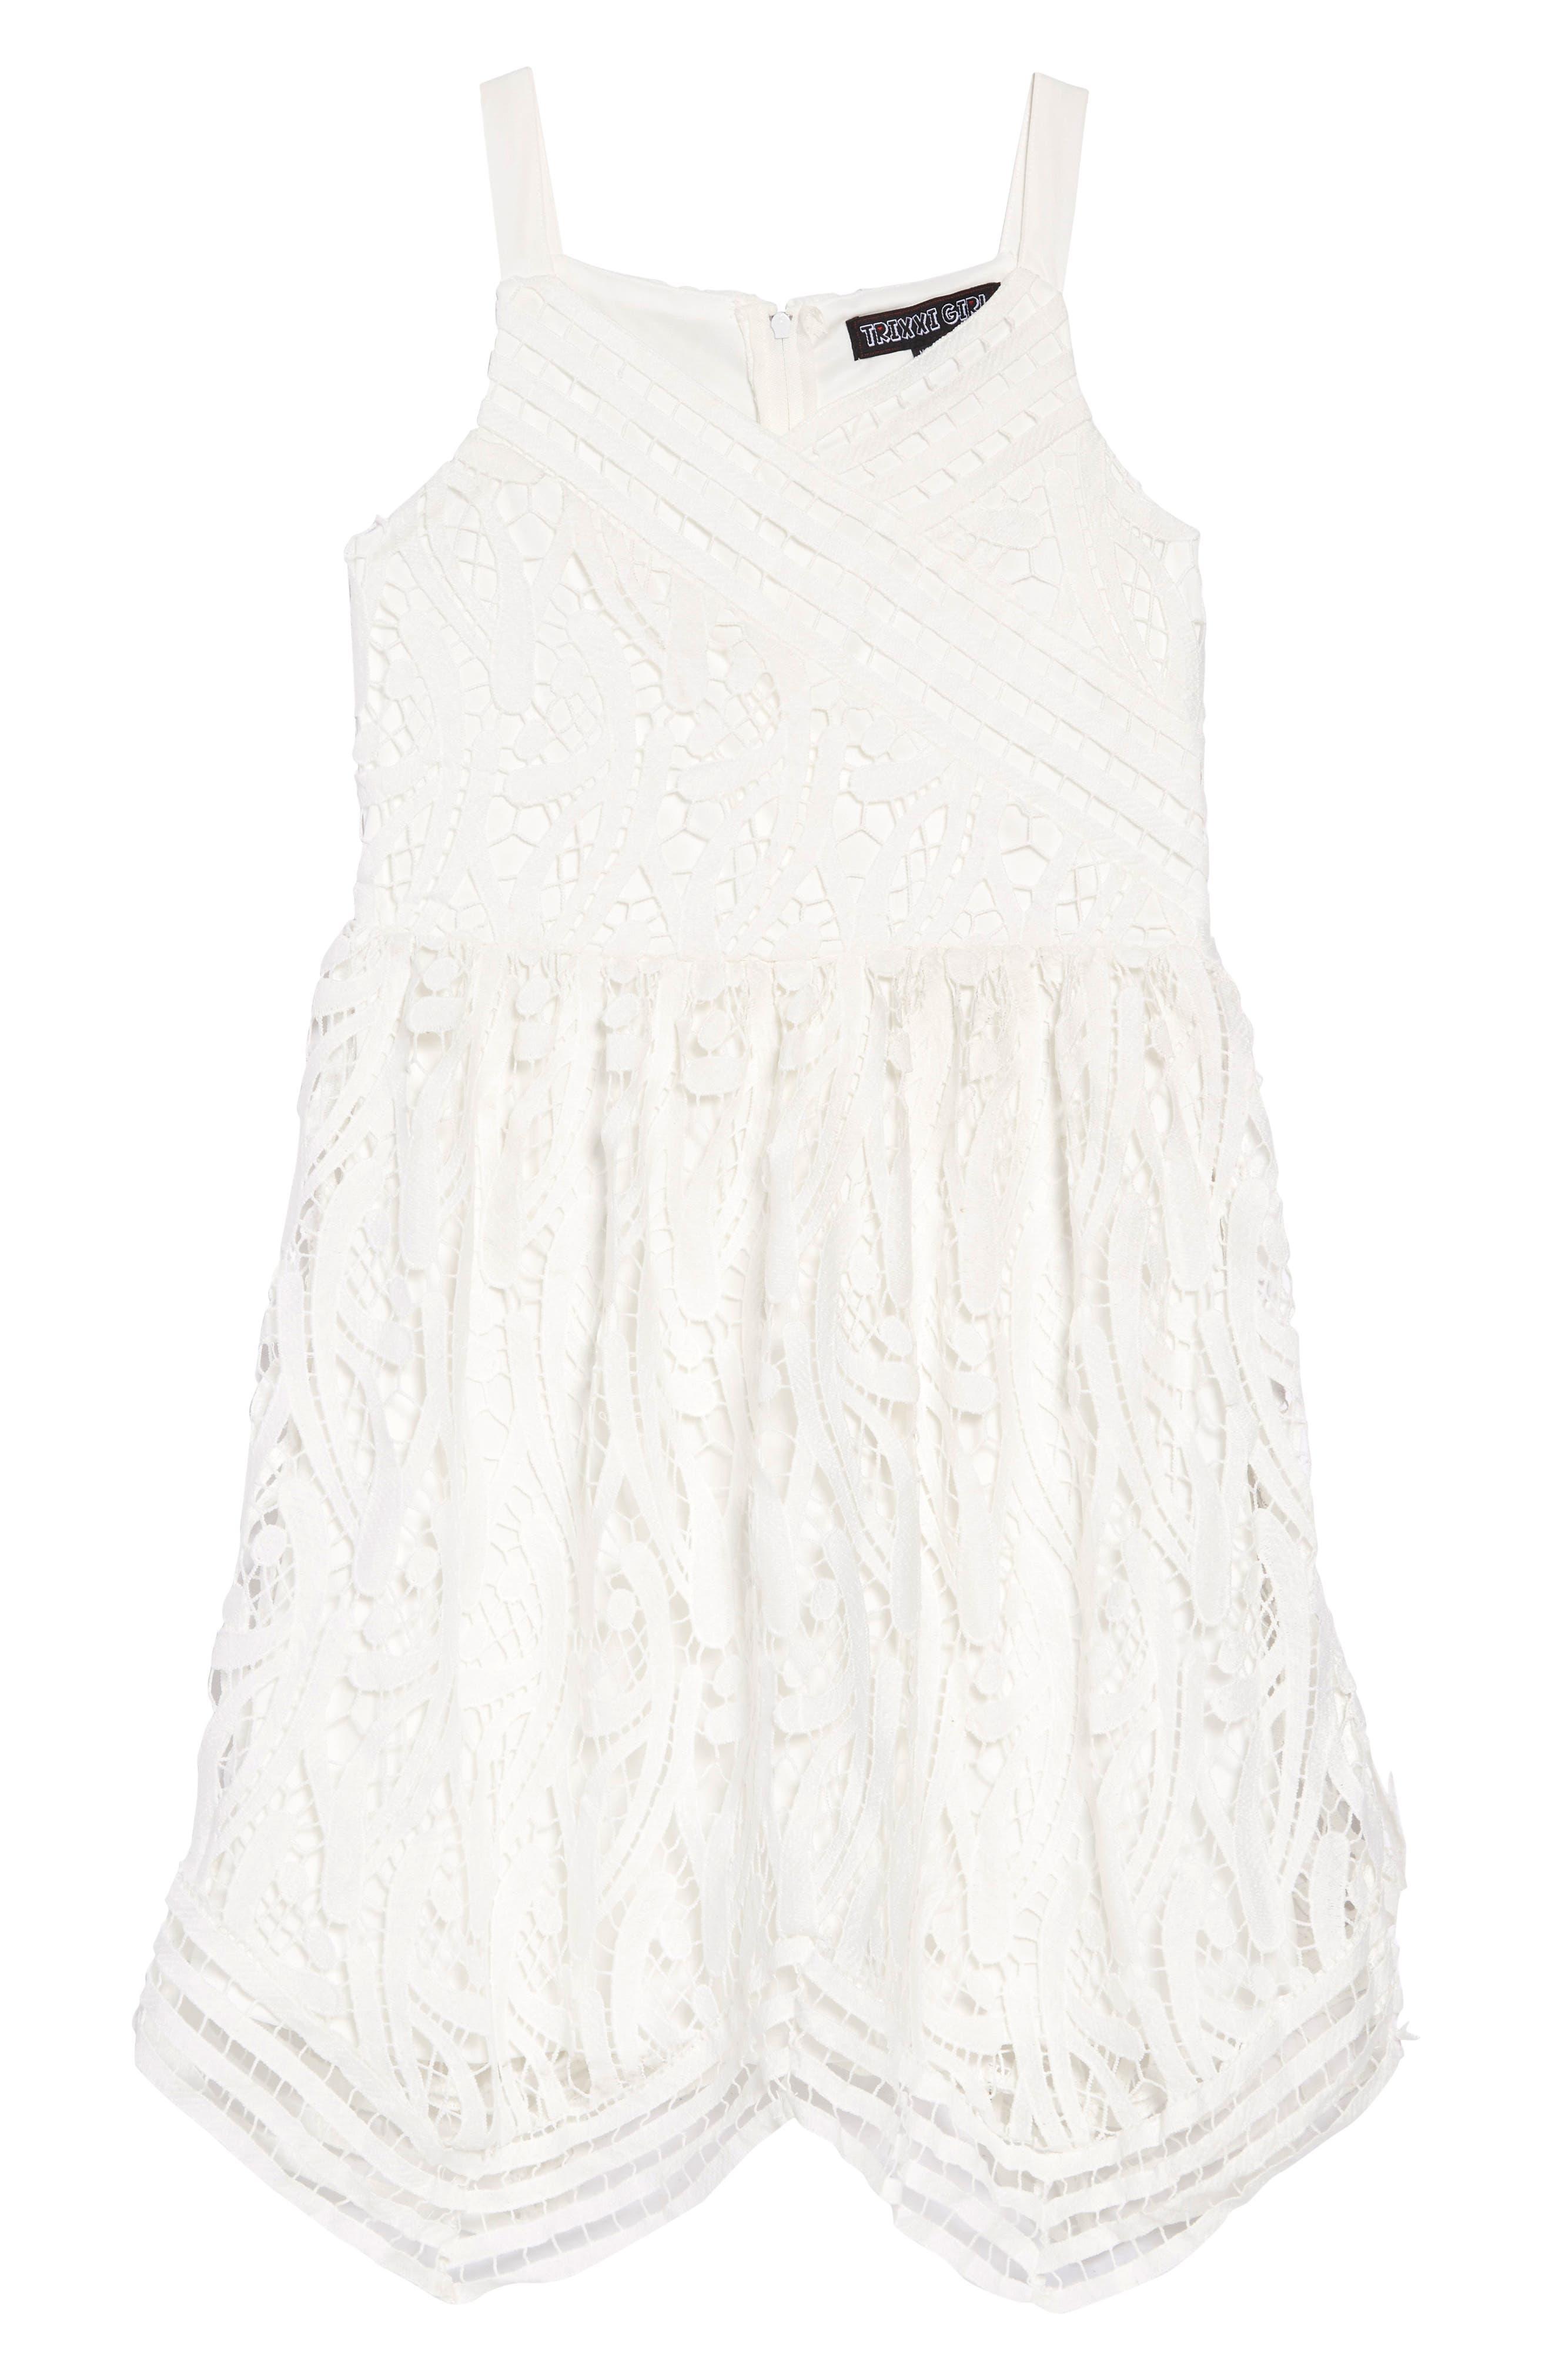 TRIXXI, Guipure Lace Dress, Main thumbnail 1, color, WHITE